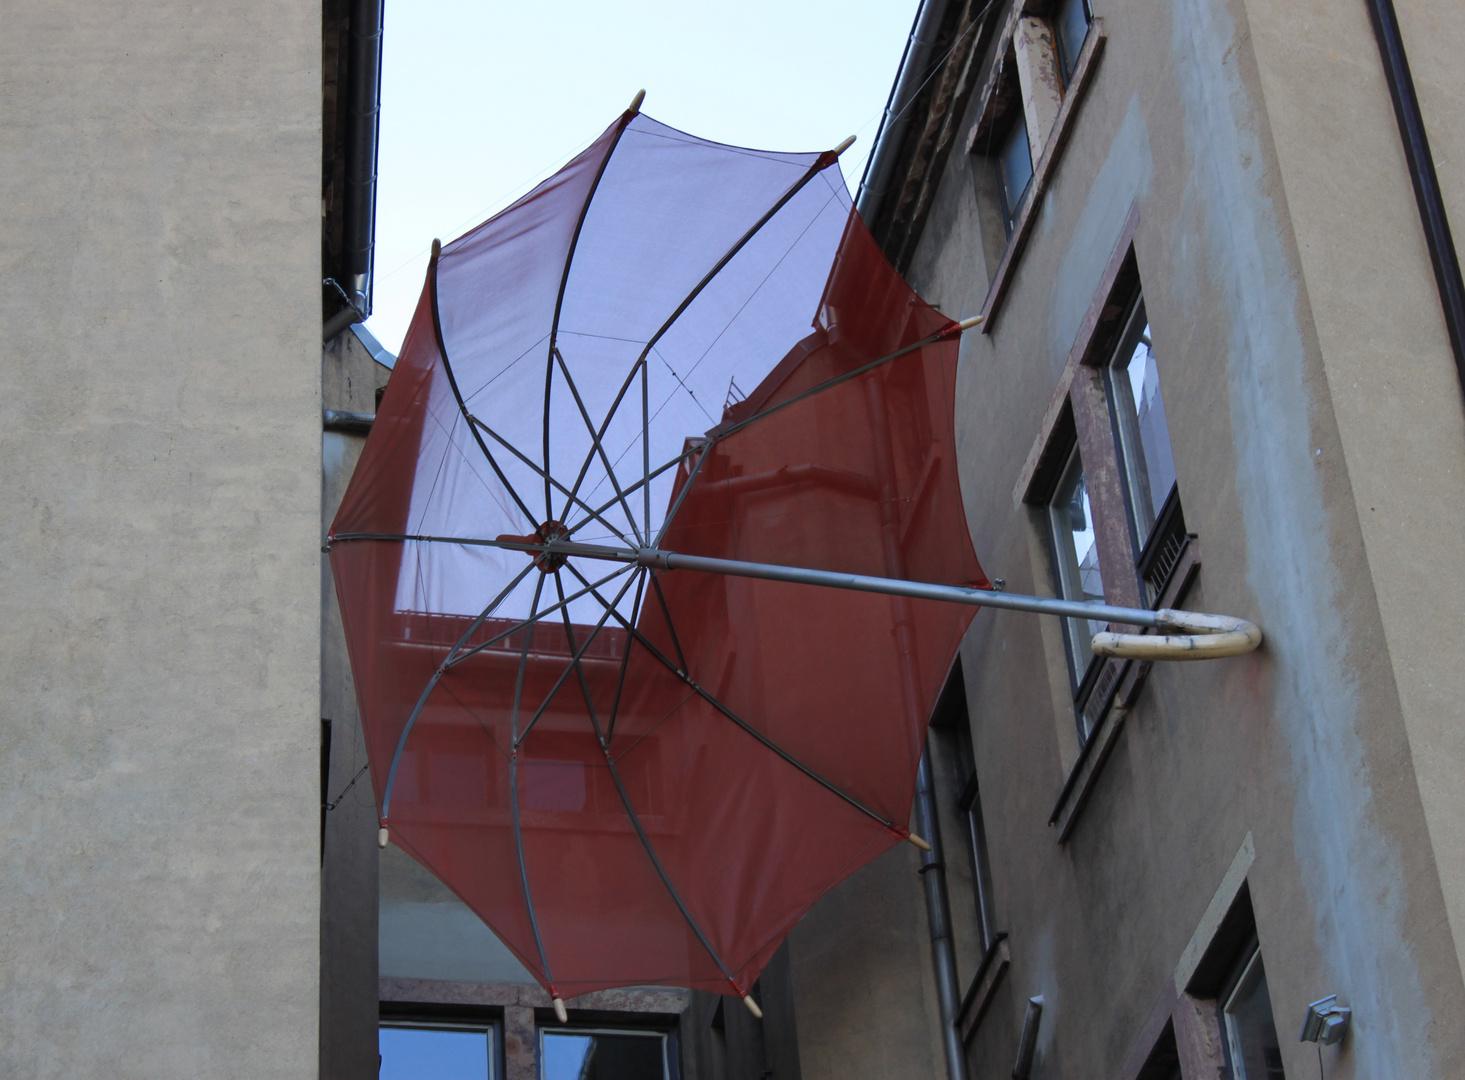 Der große Regenschirm / The large umbrella